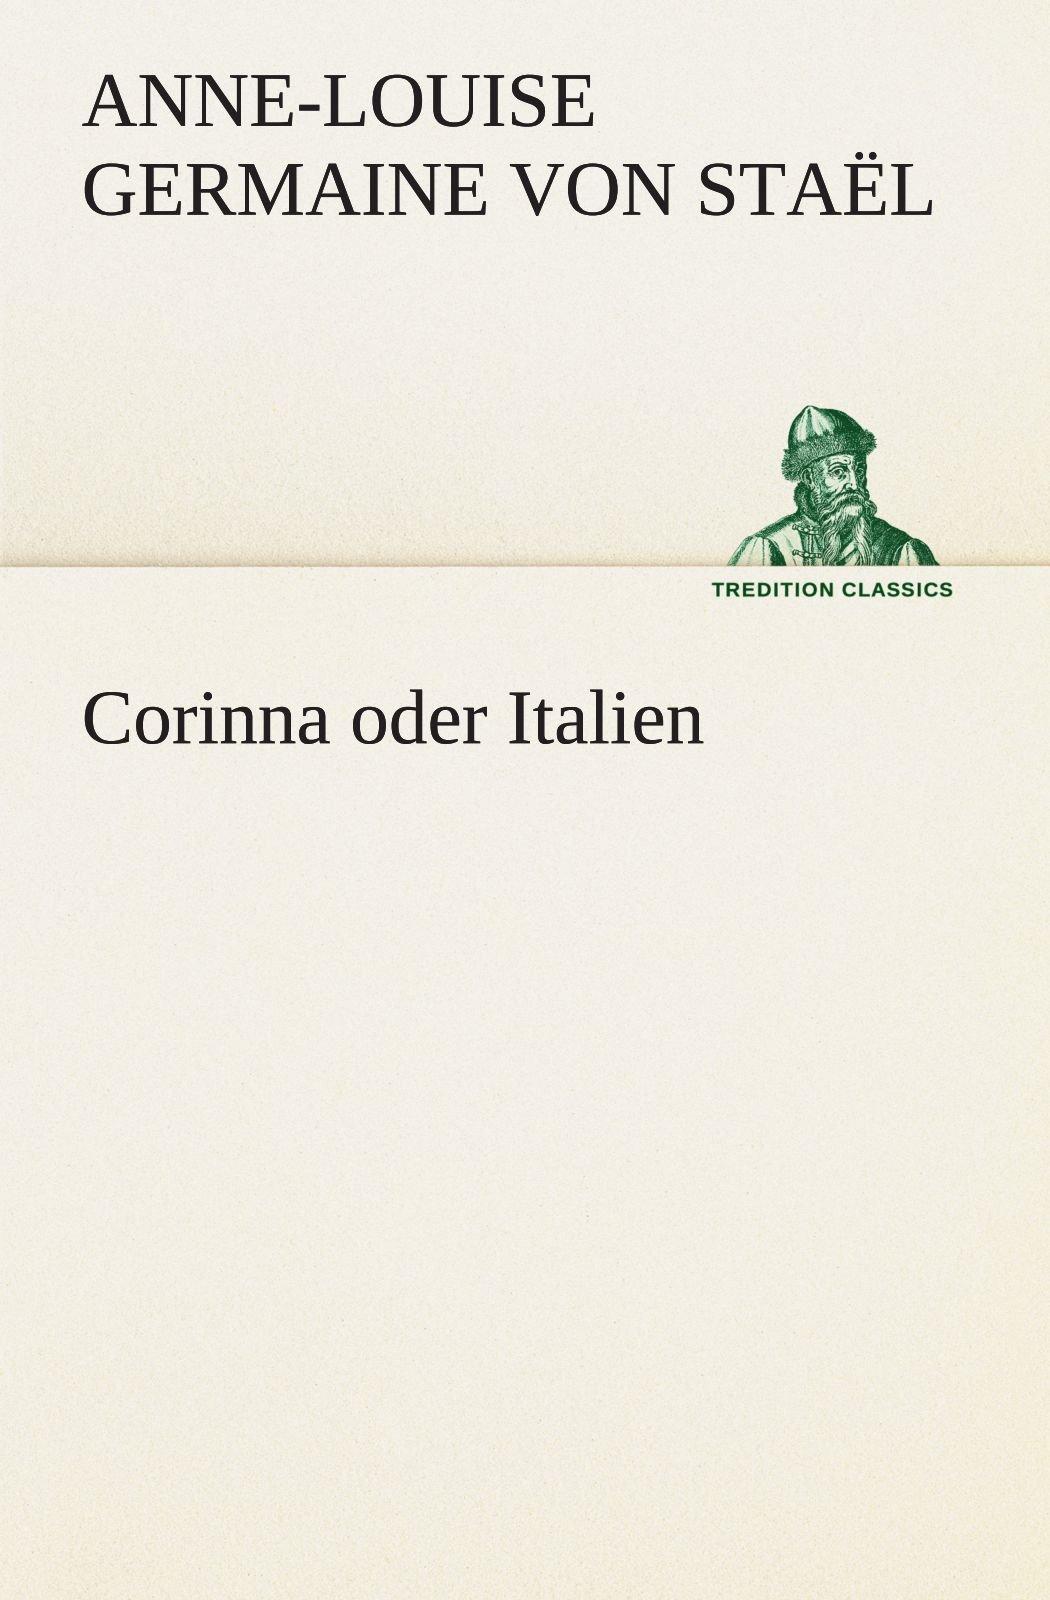 Download Corinna oder Italien (TREDITION CLASSICS) (German Edition) PDF